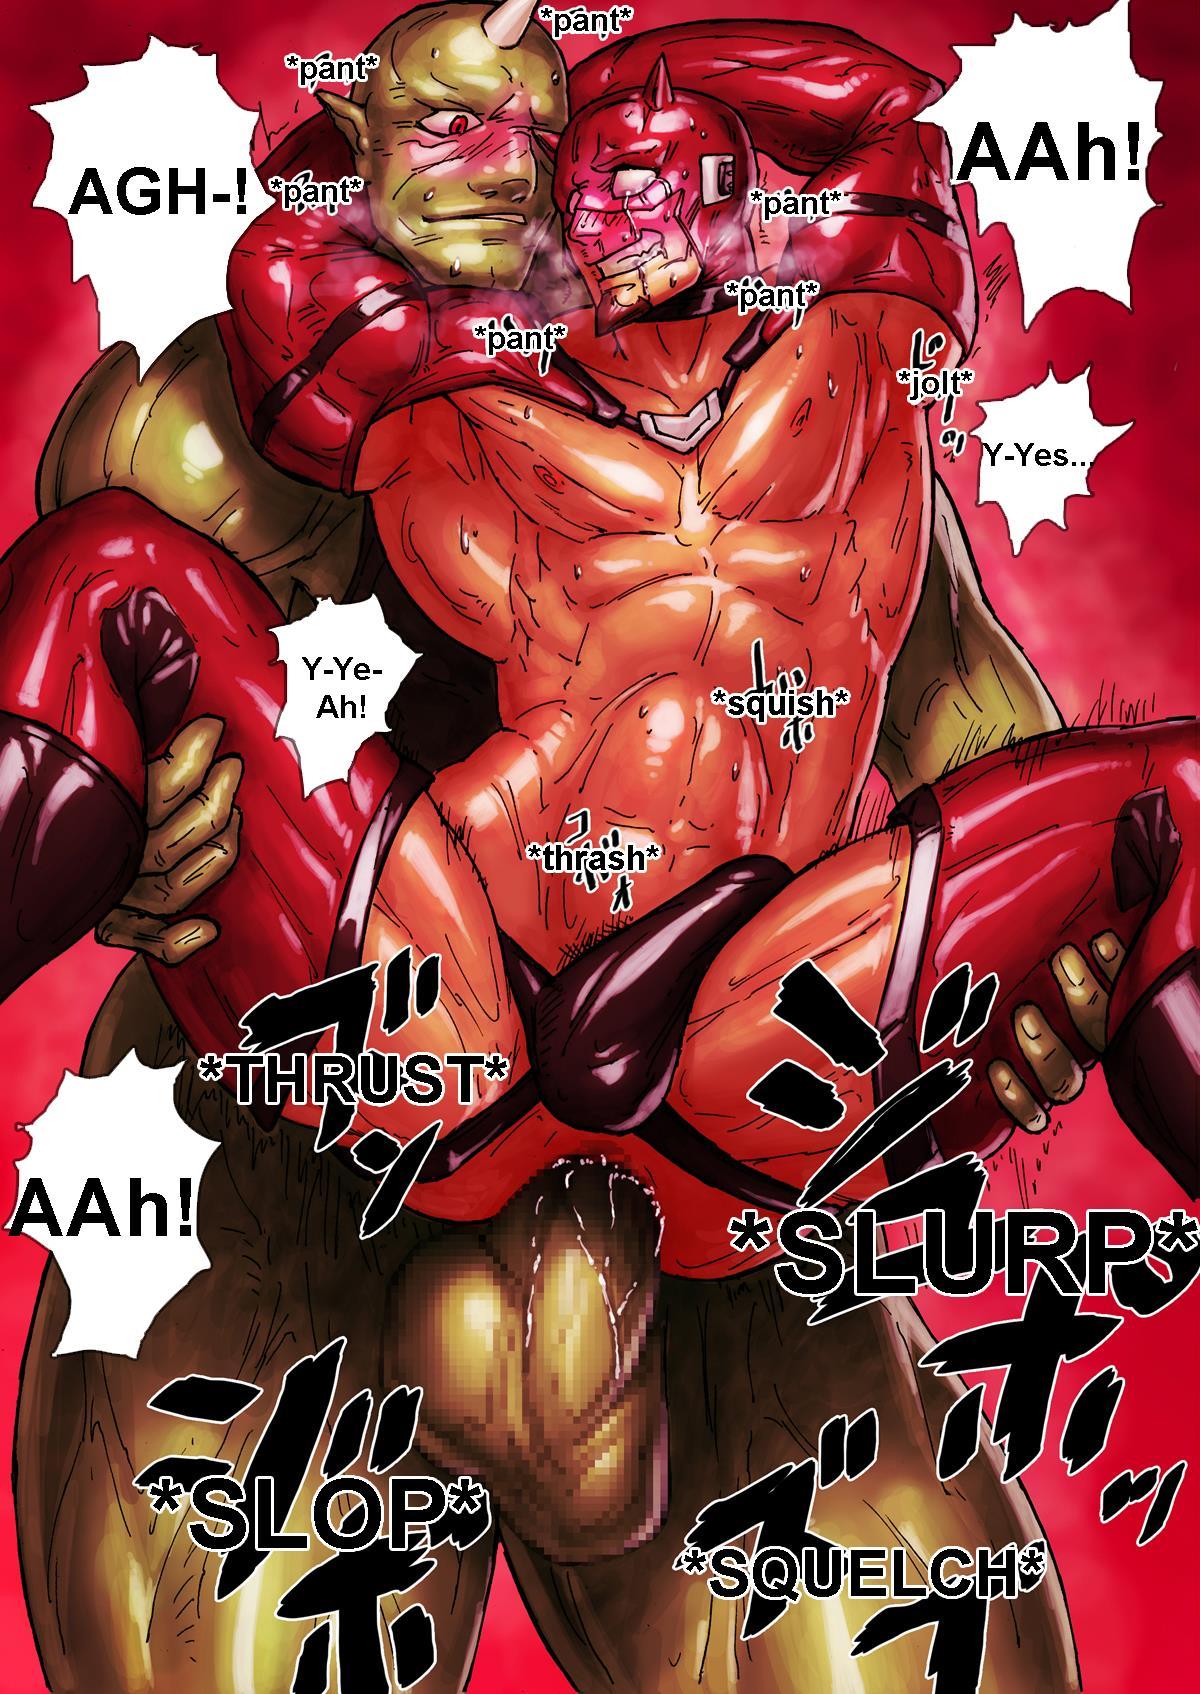 ZARK the Squeezer [Rokudenashi] - Foto 12